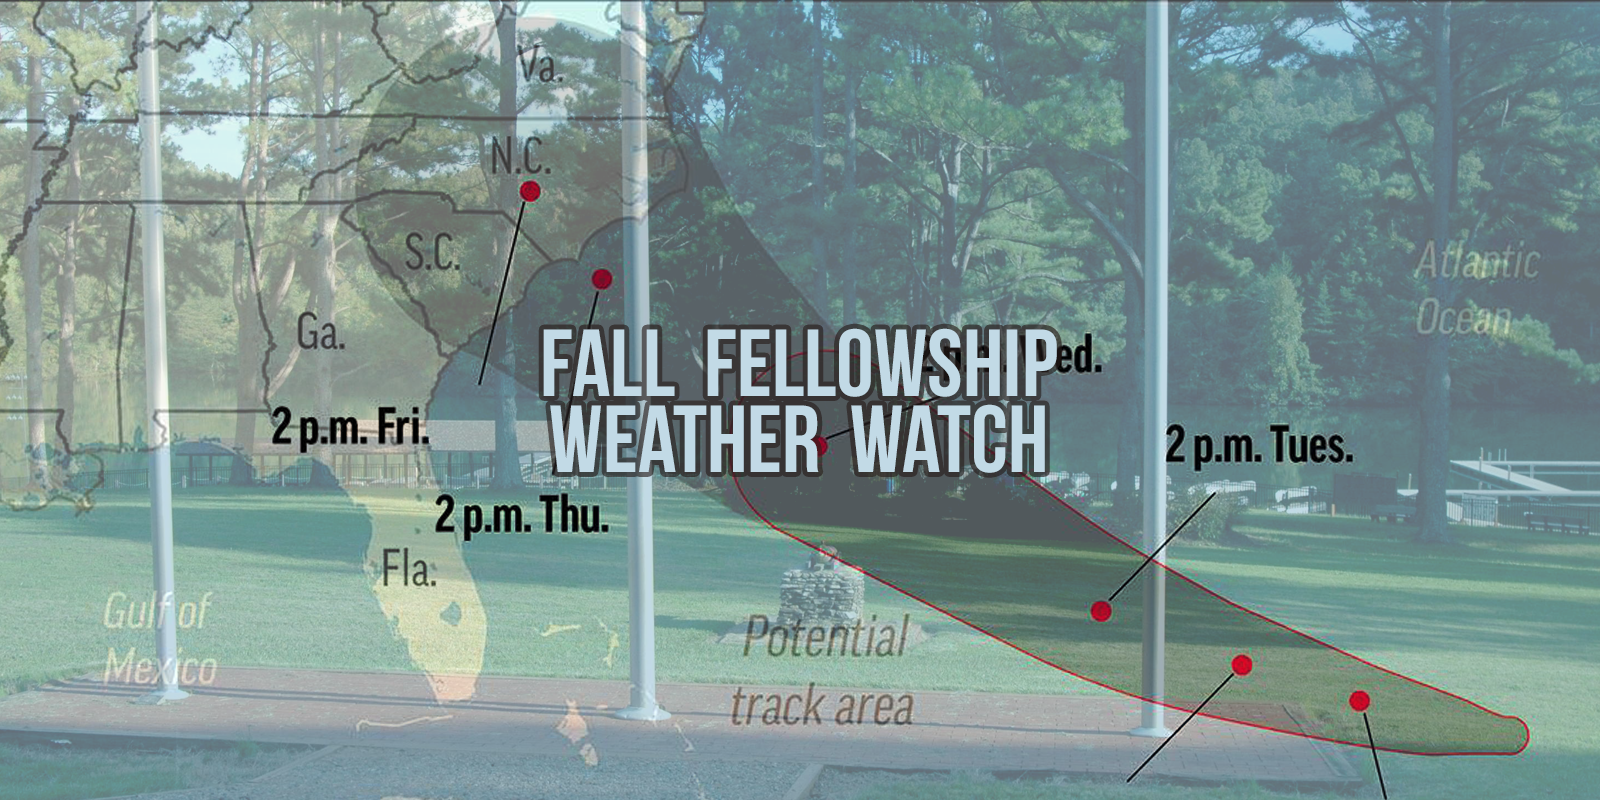 Fall Fellowship Weather Watch